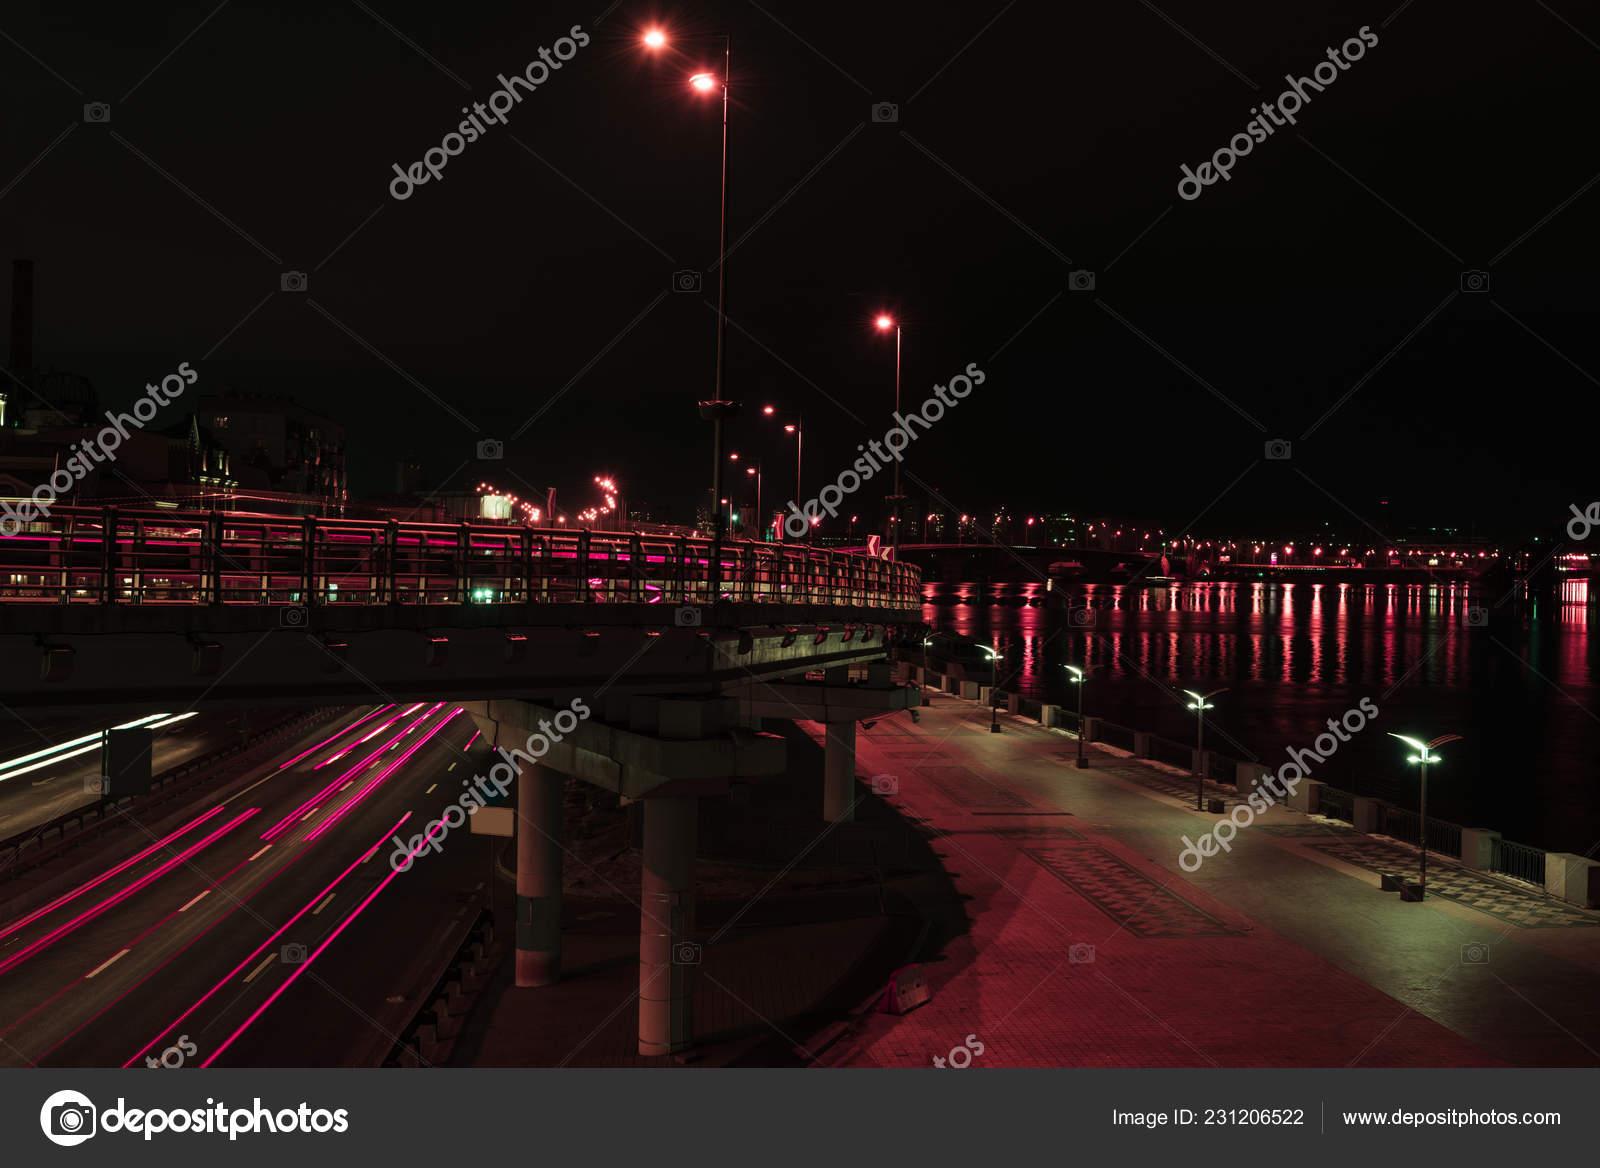 Lunga esposizione strada ponte con illuminazione notturna u foto